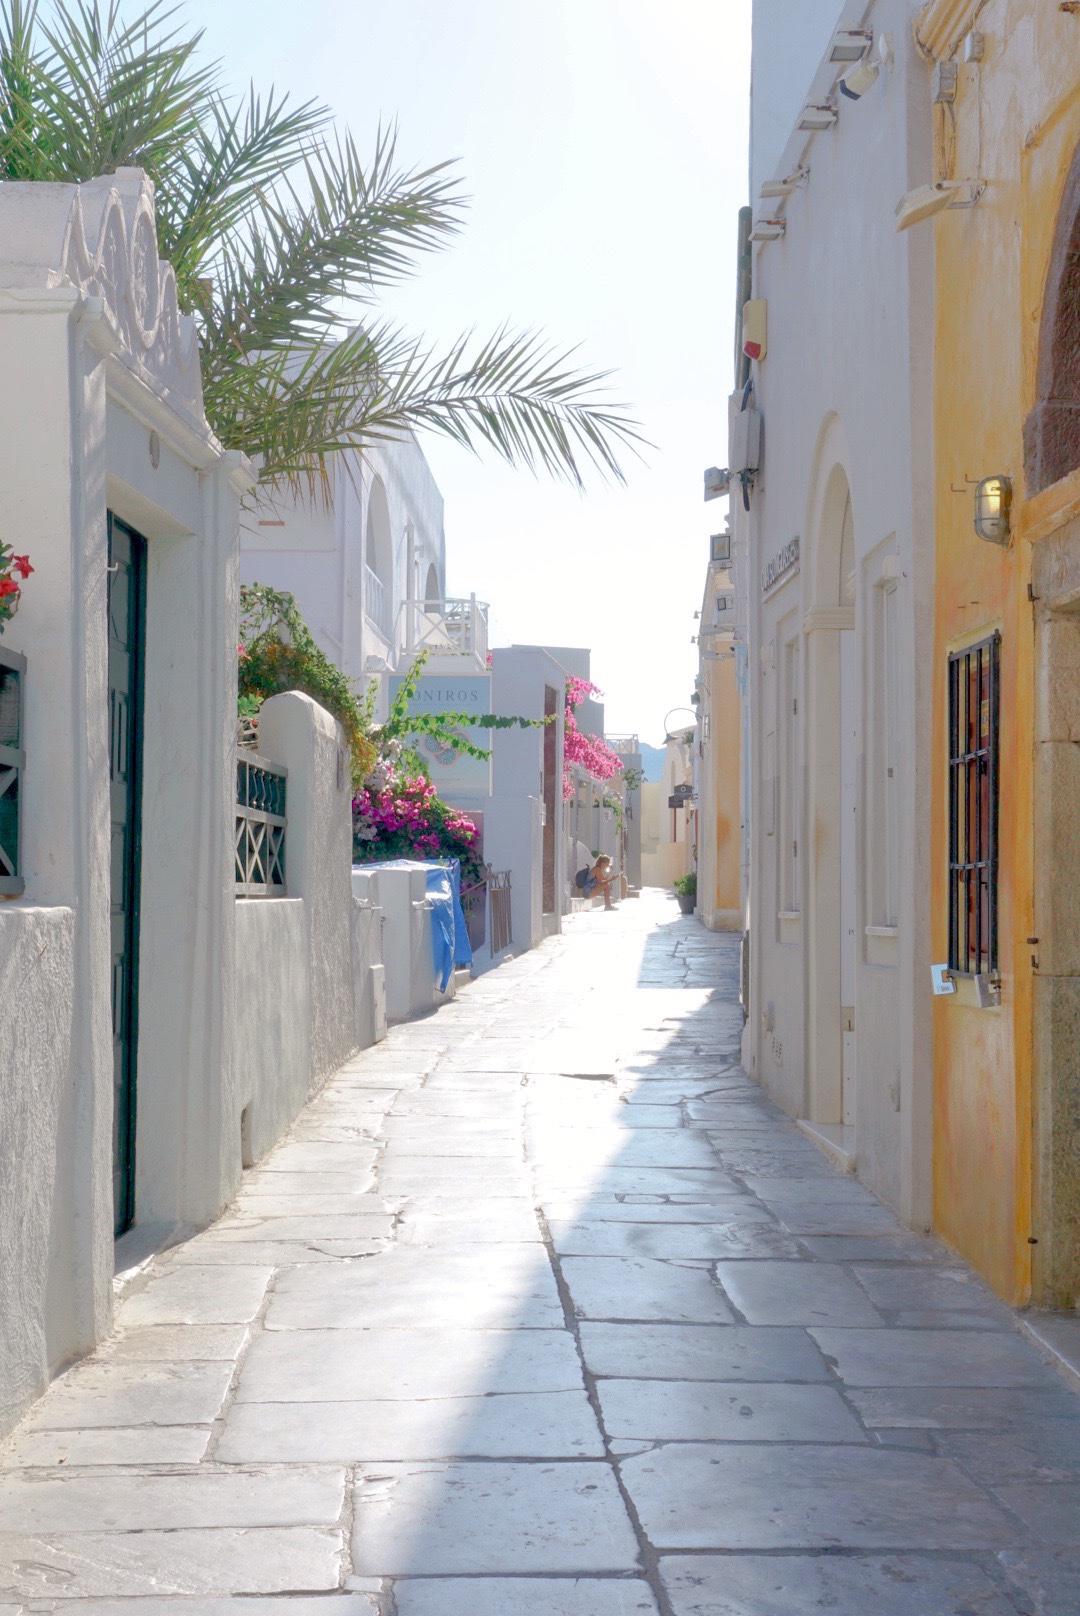 acs 0267 - A Few Days in Santorini